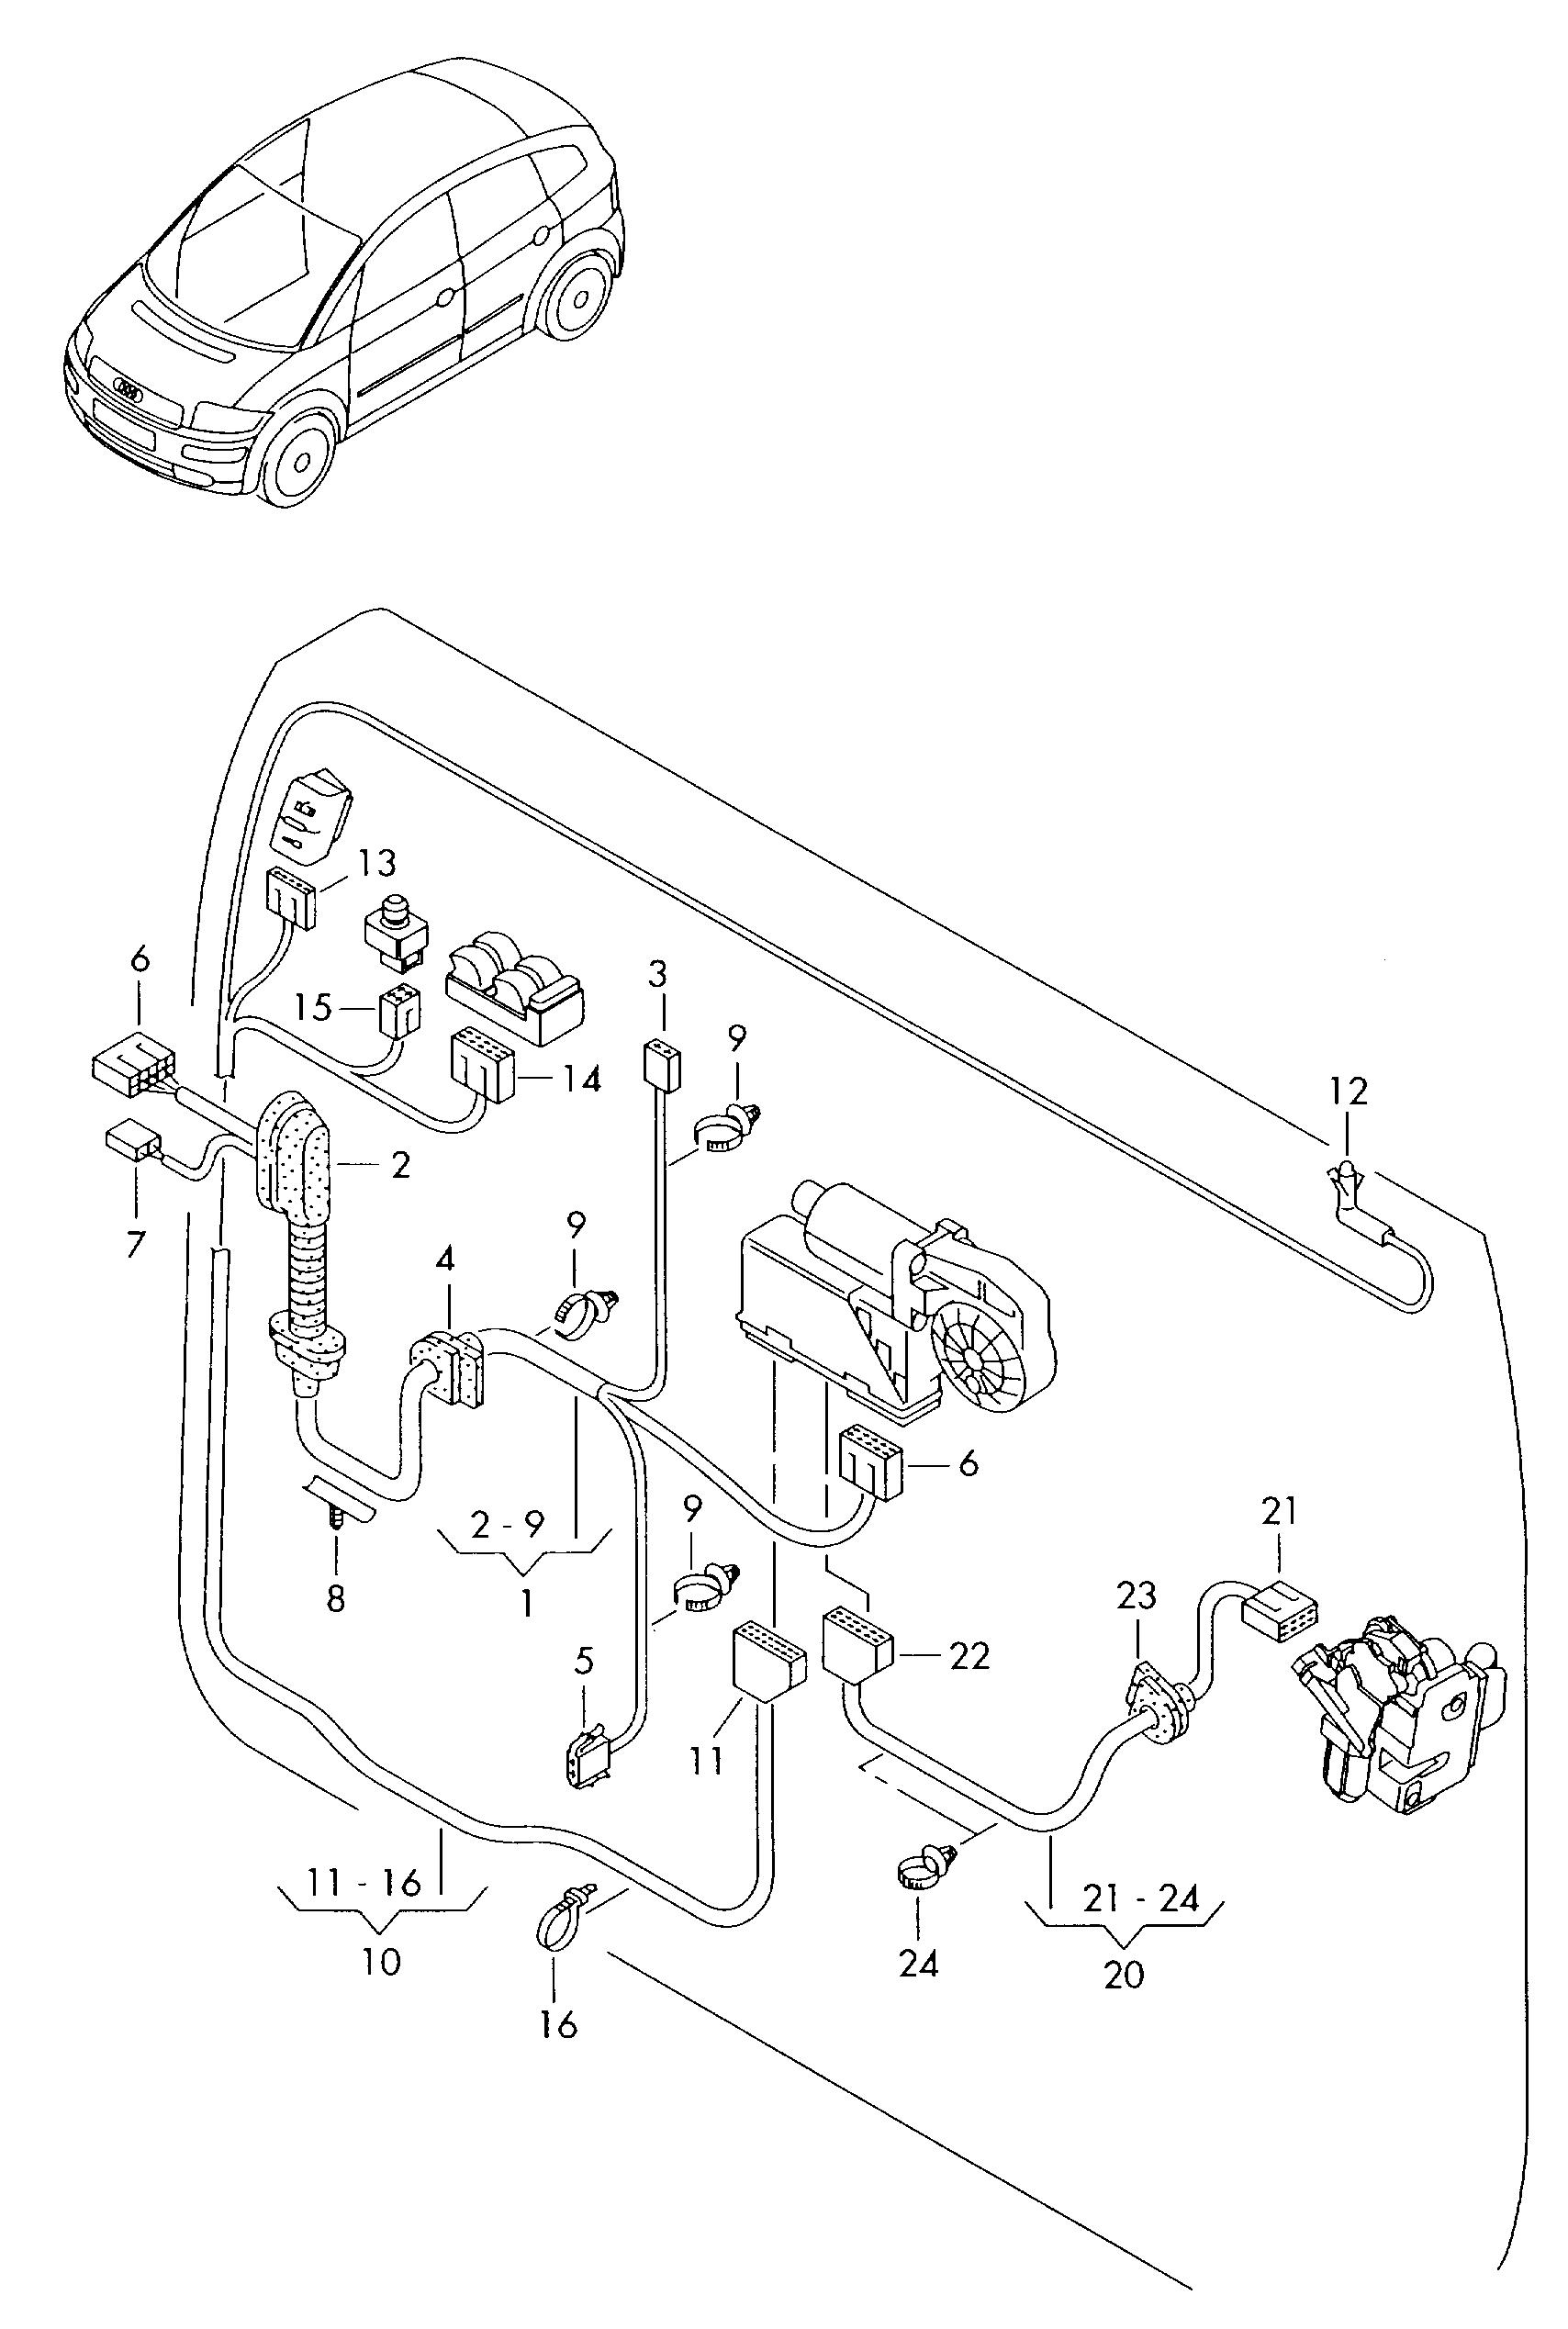 Audi A2 Central Locking Wiring Diagram - Wiring Diagramsflu.hell.lesvignoblesguimberteau.fr